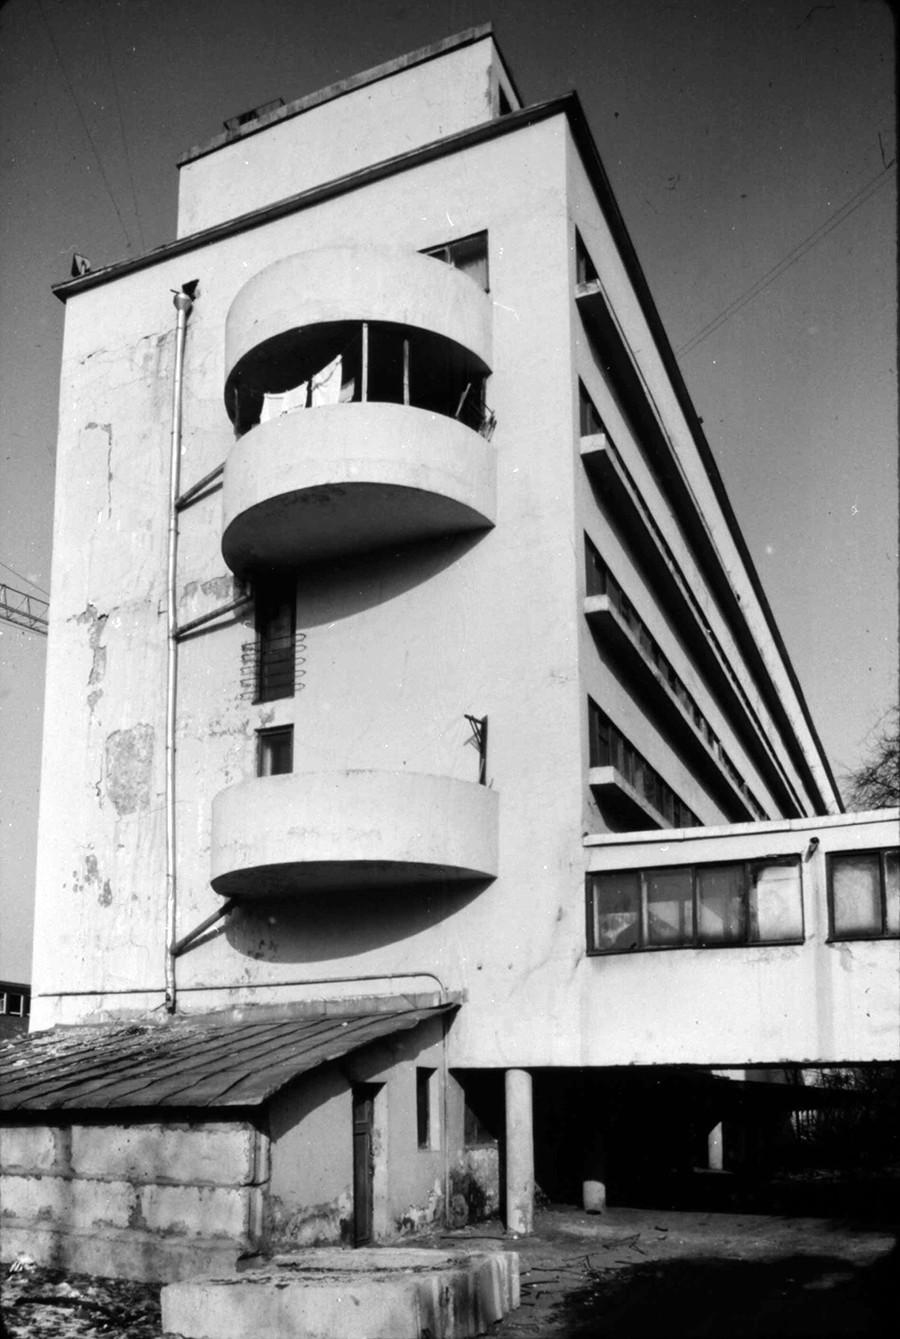 Immeuble résidentiel du Narkomfin (1928). Façade sud. Moscou. Photo: 1984